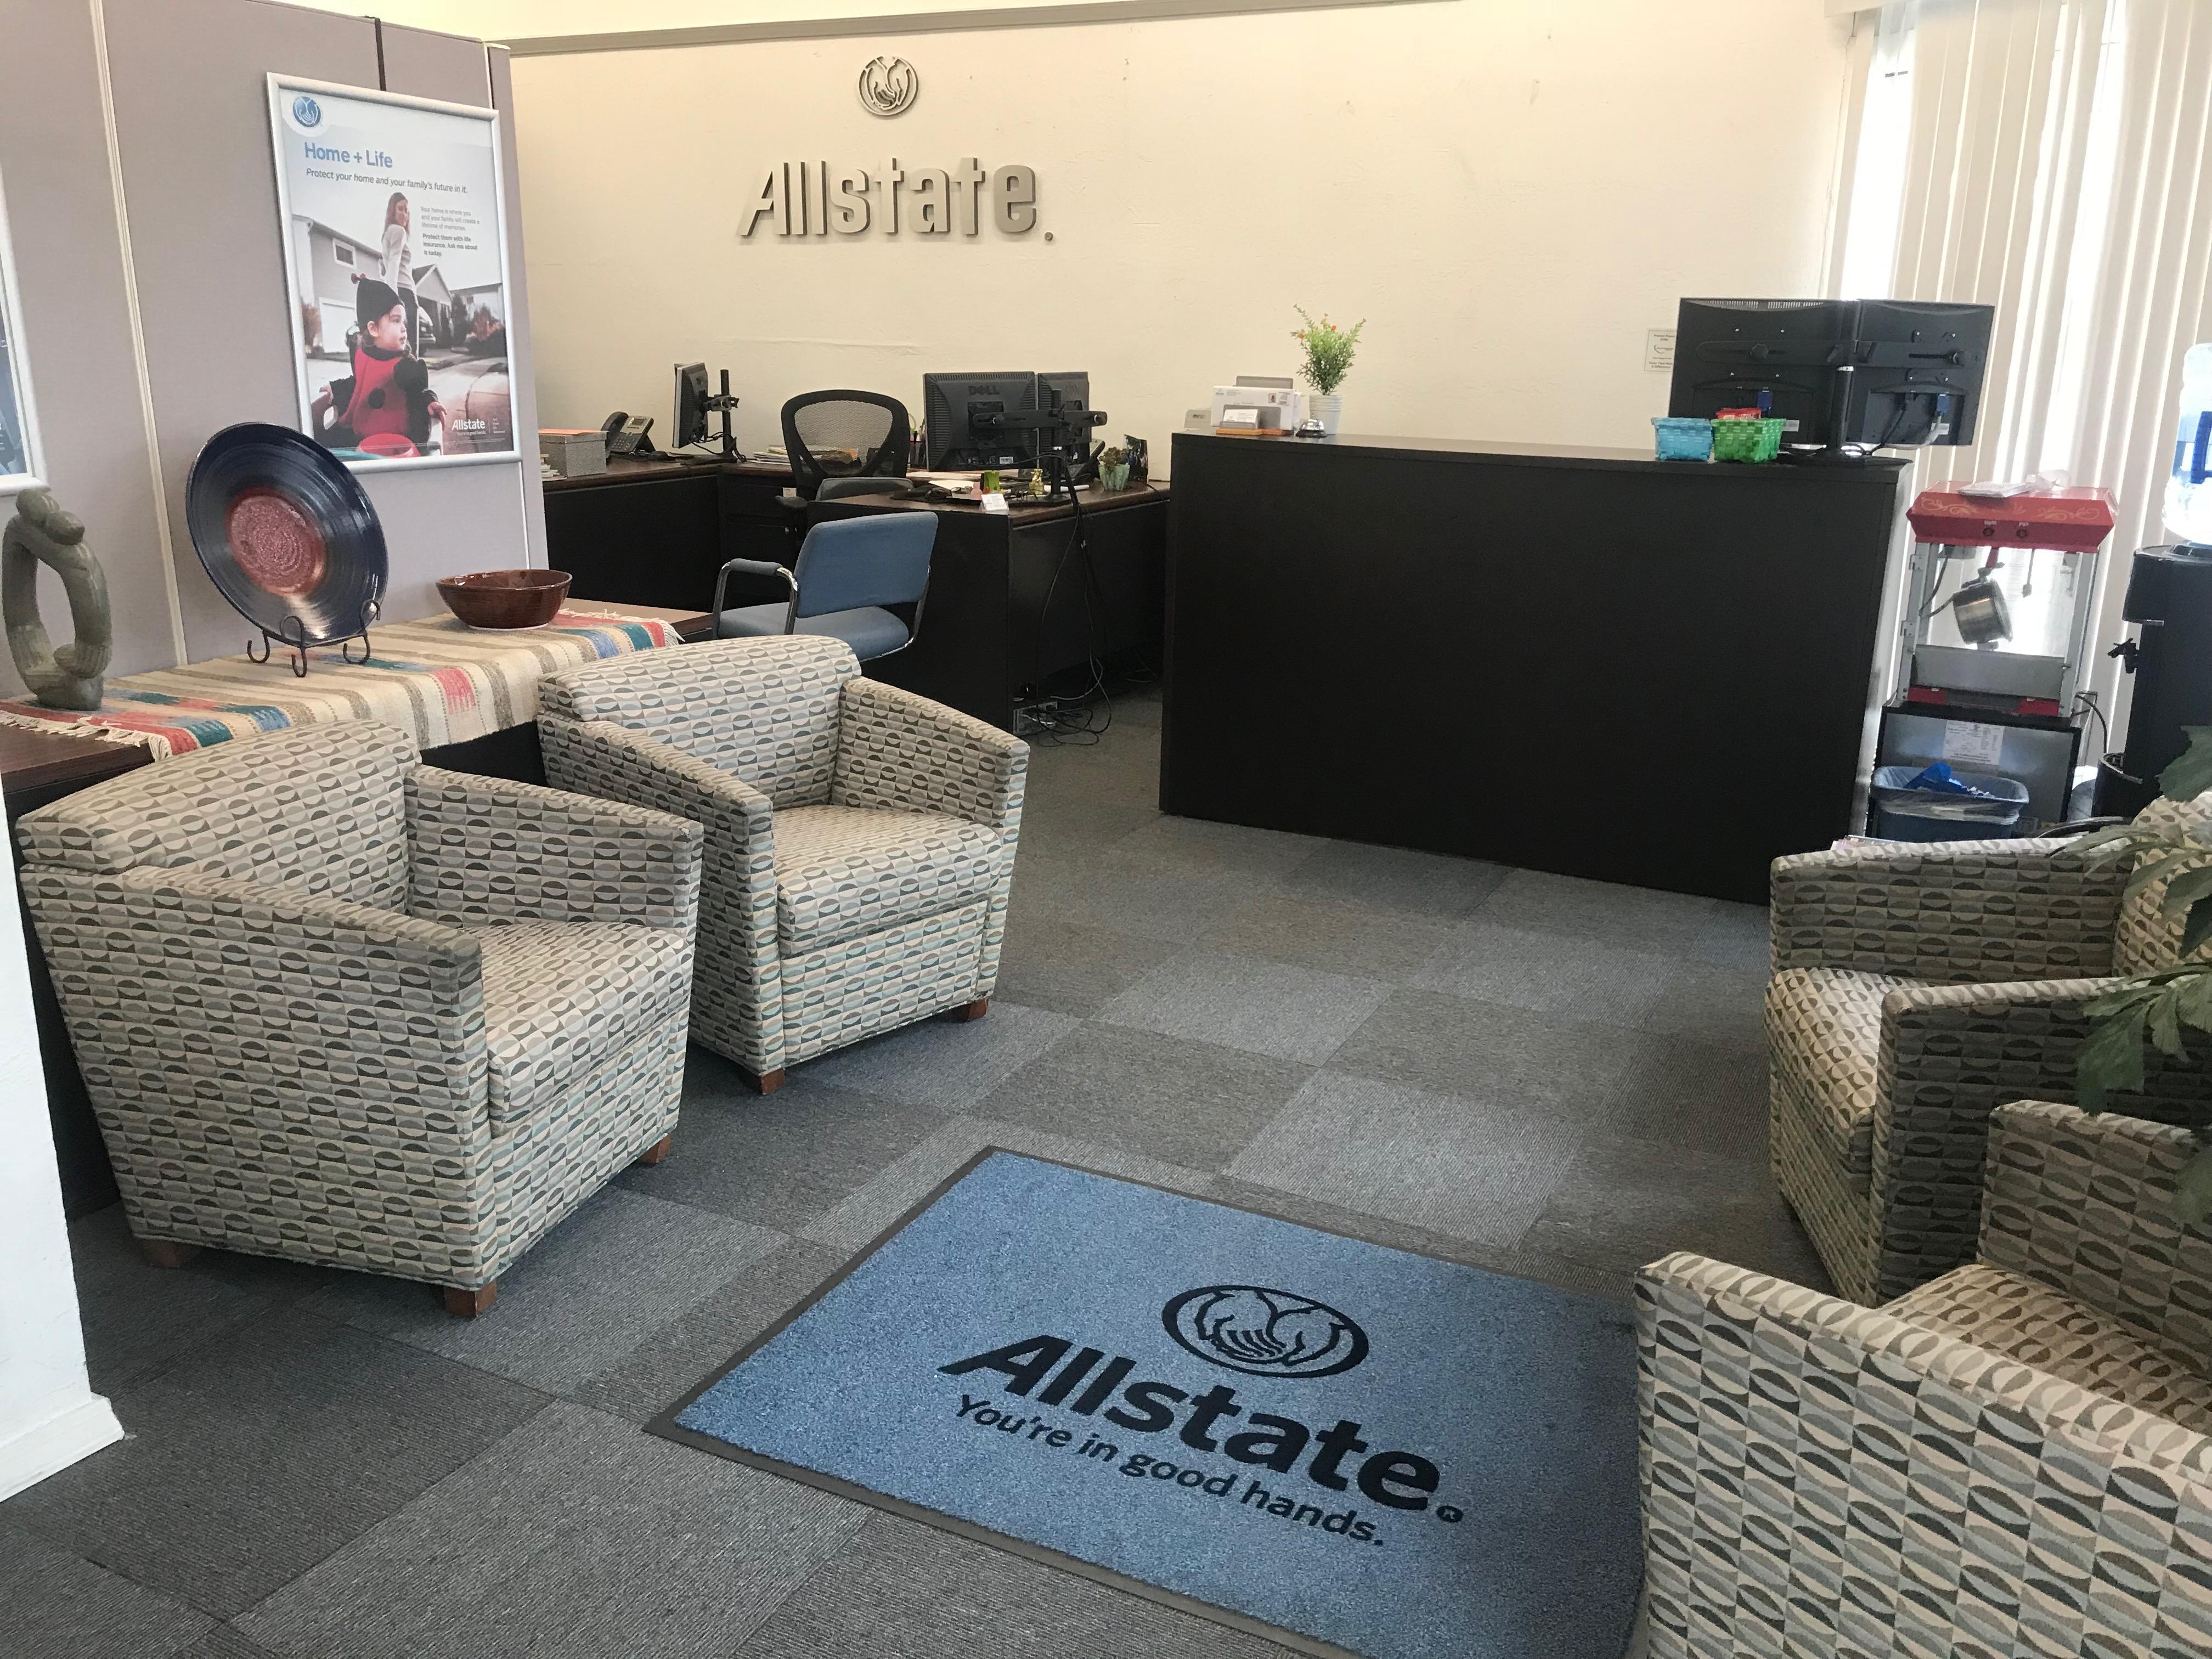 Timothy Carter: Allstate Insurance image 1